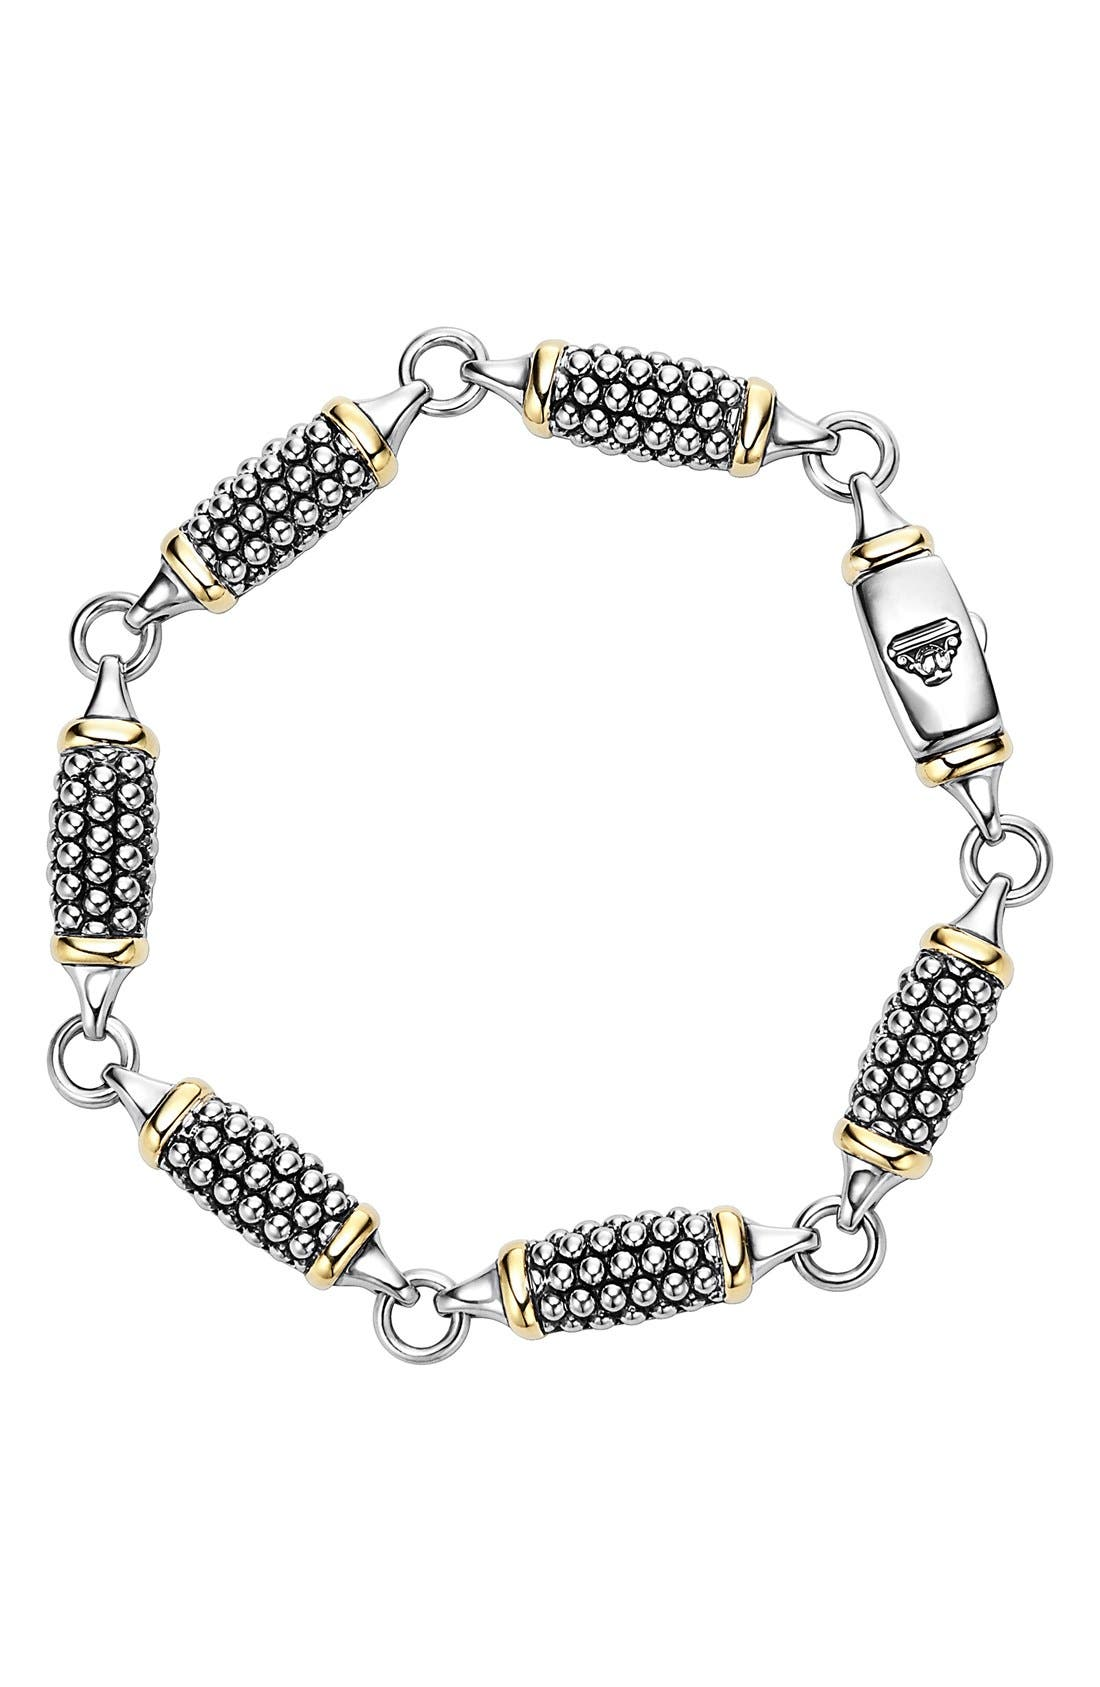 'Caviar Forever' Link Bracelet,                             Main thumbnail 1, color,                             040